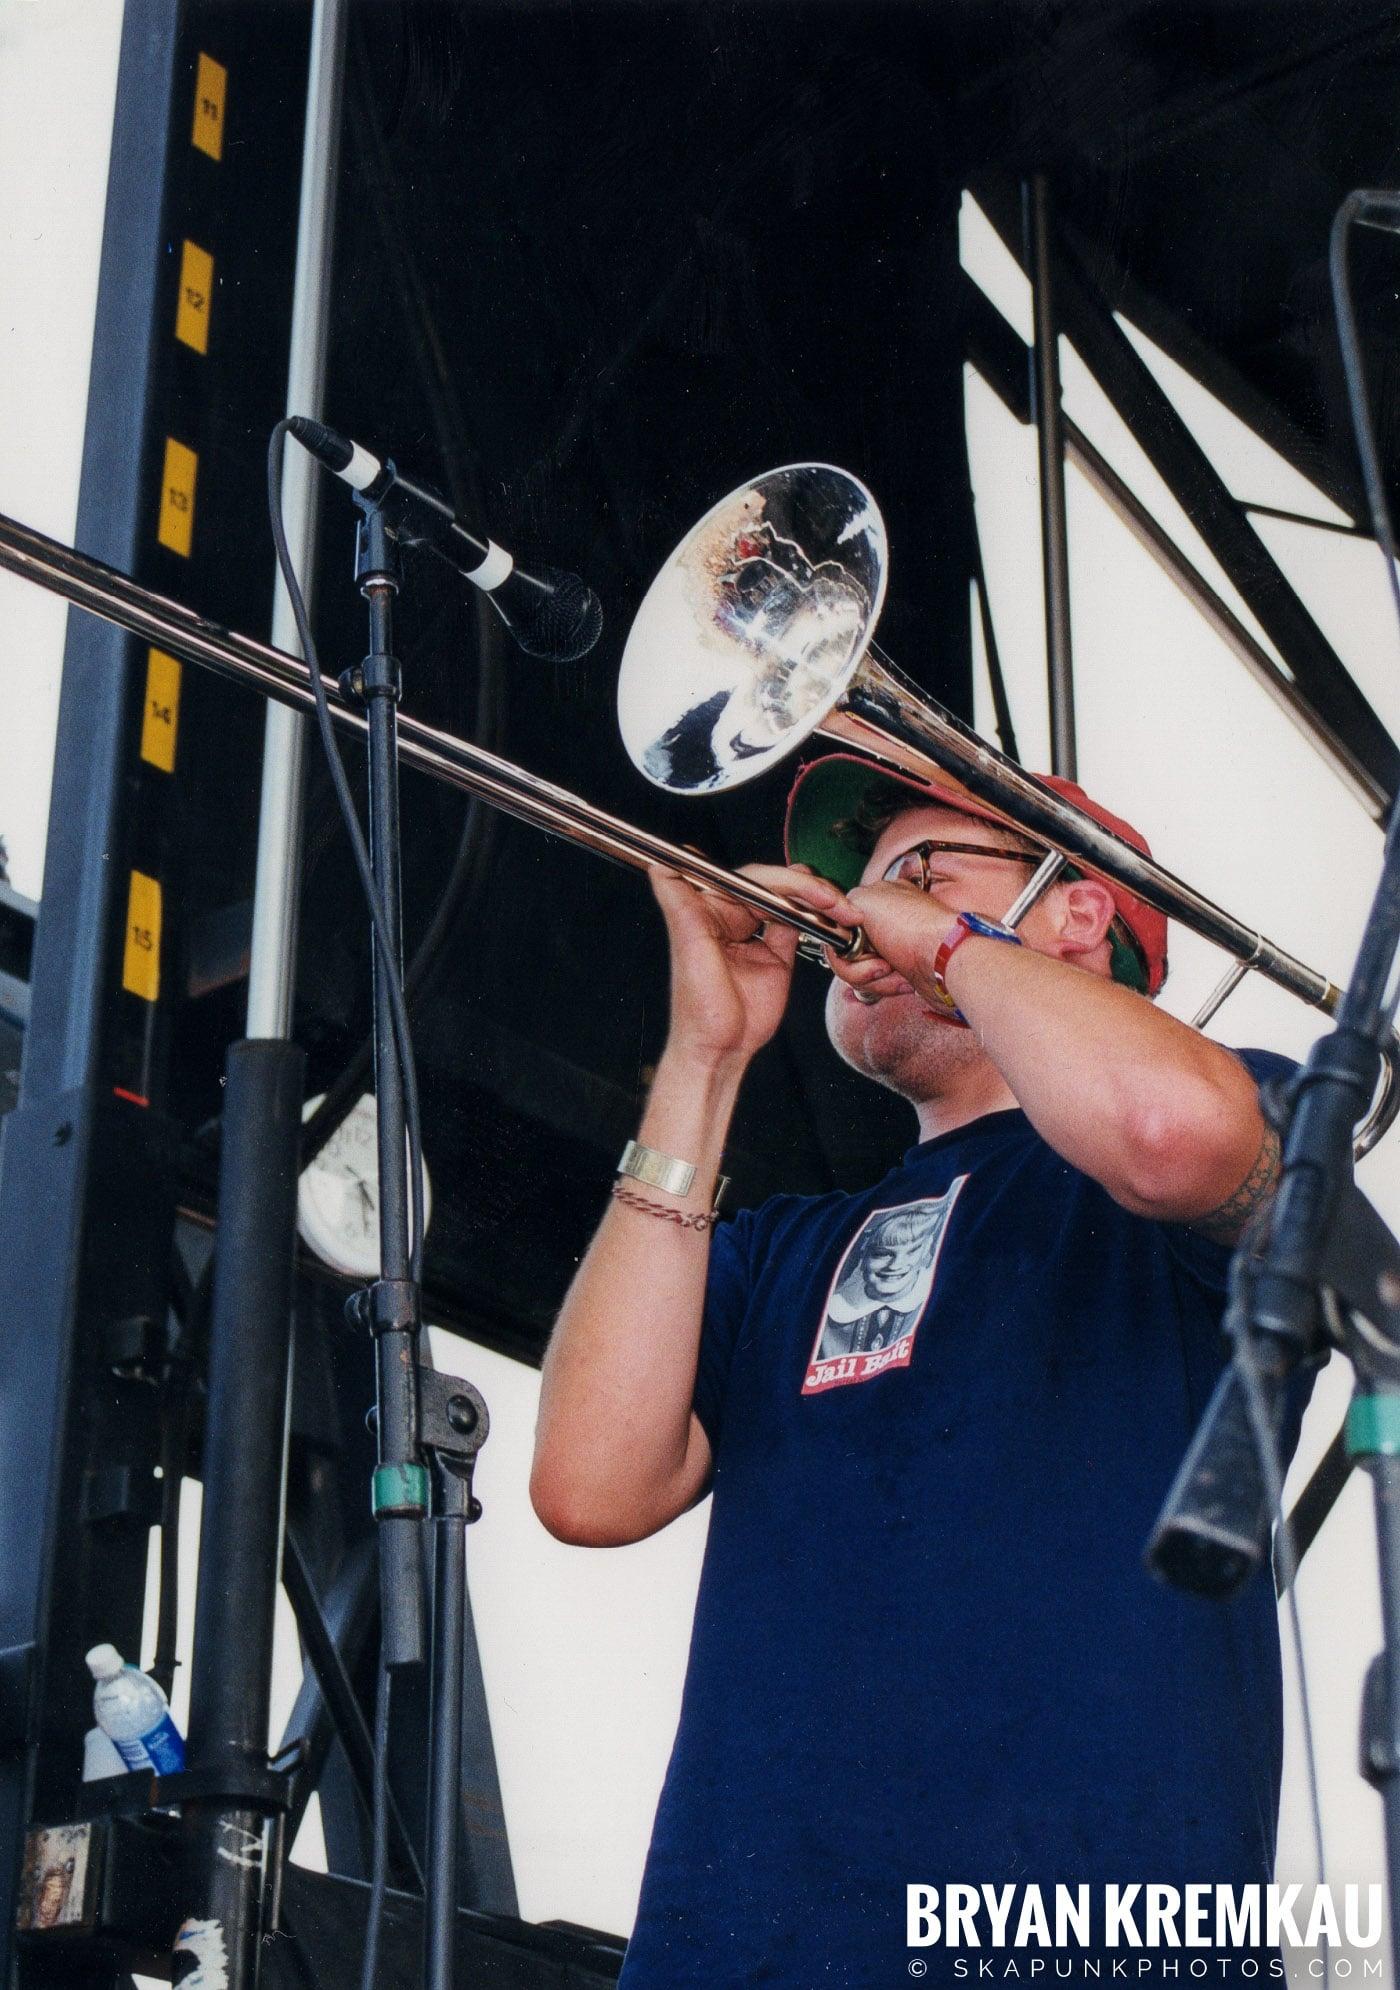 Less Than Jake @ Vans Warped Tour, Randall's Island, NYC - 7.16.99 (8)